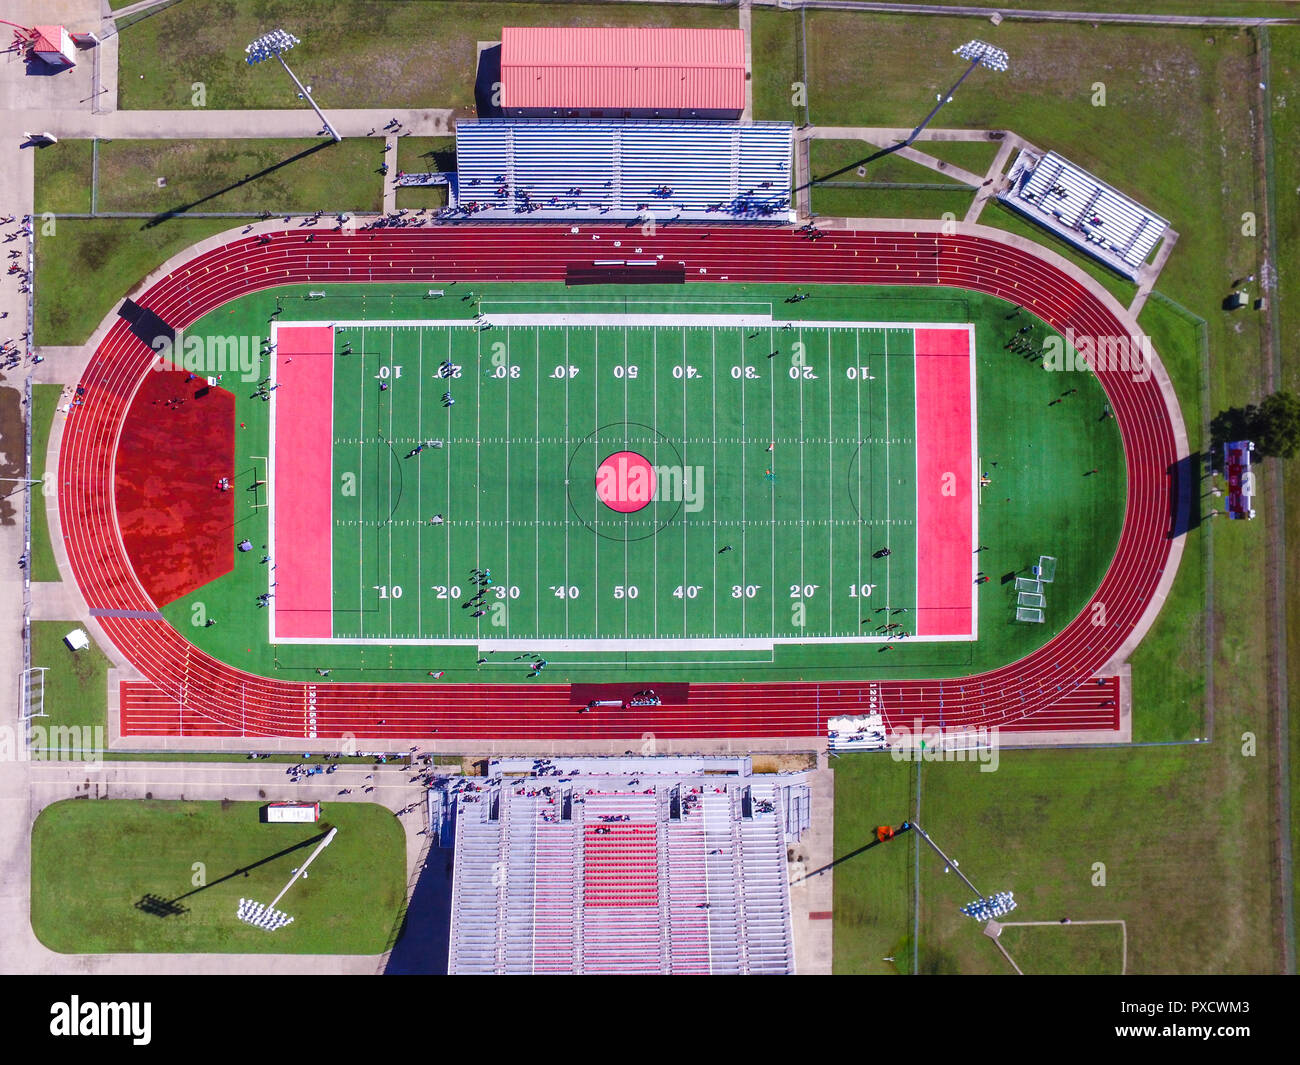 Aerial Football Field - Stock Image